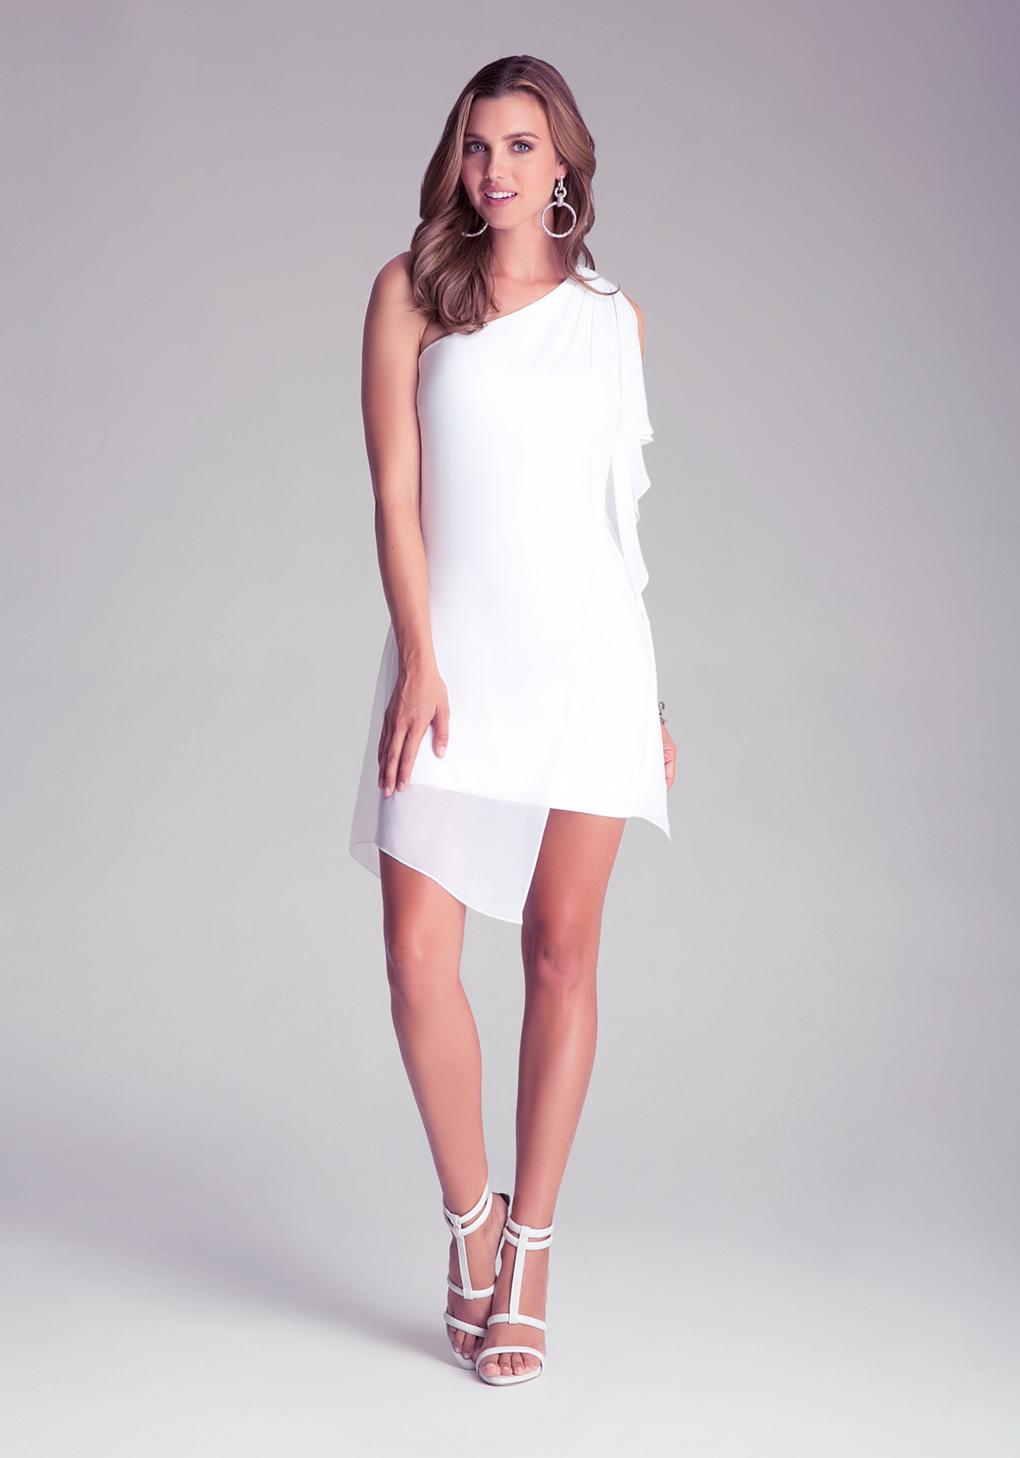 0bff502ef5 Bebe Asymmetric Drape Dress in White - Lyst